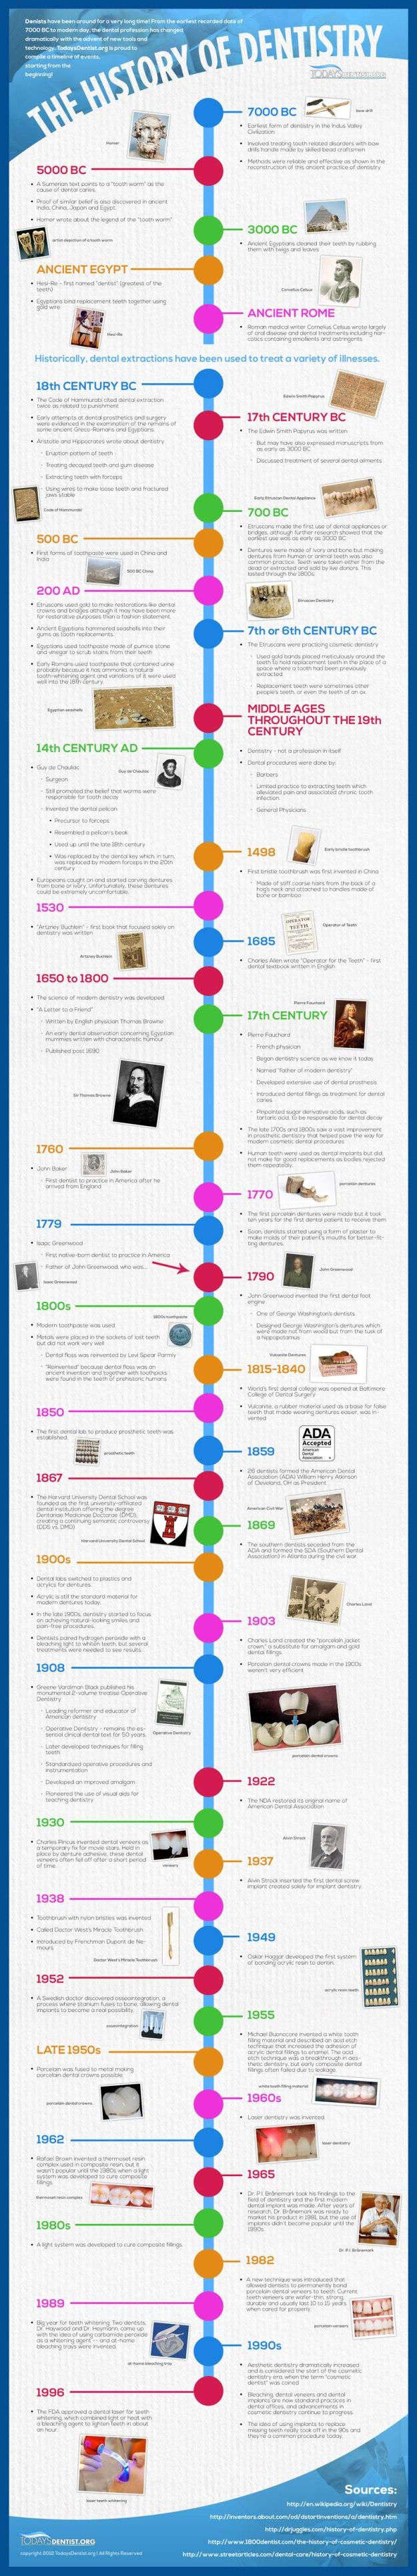 history-of-dentistry